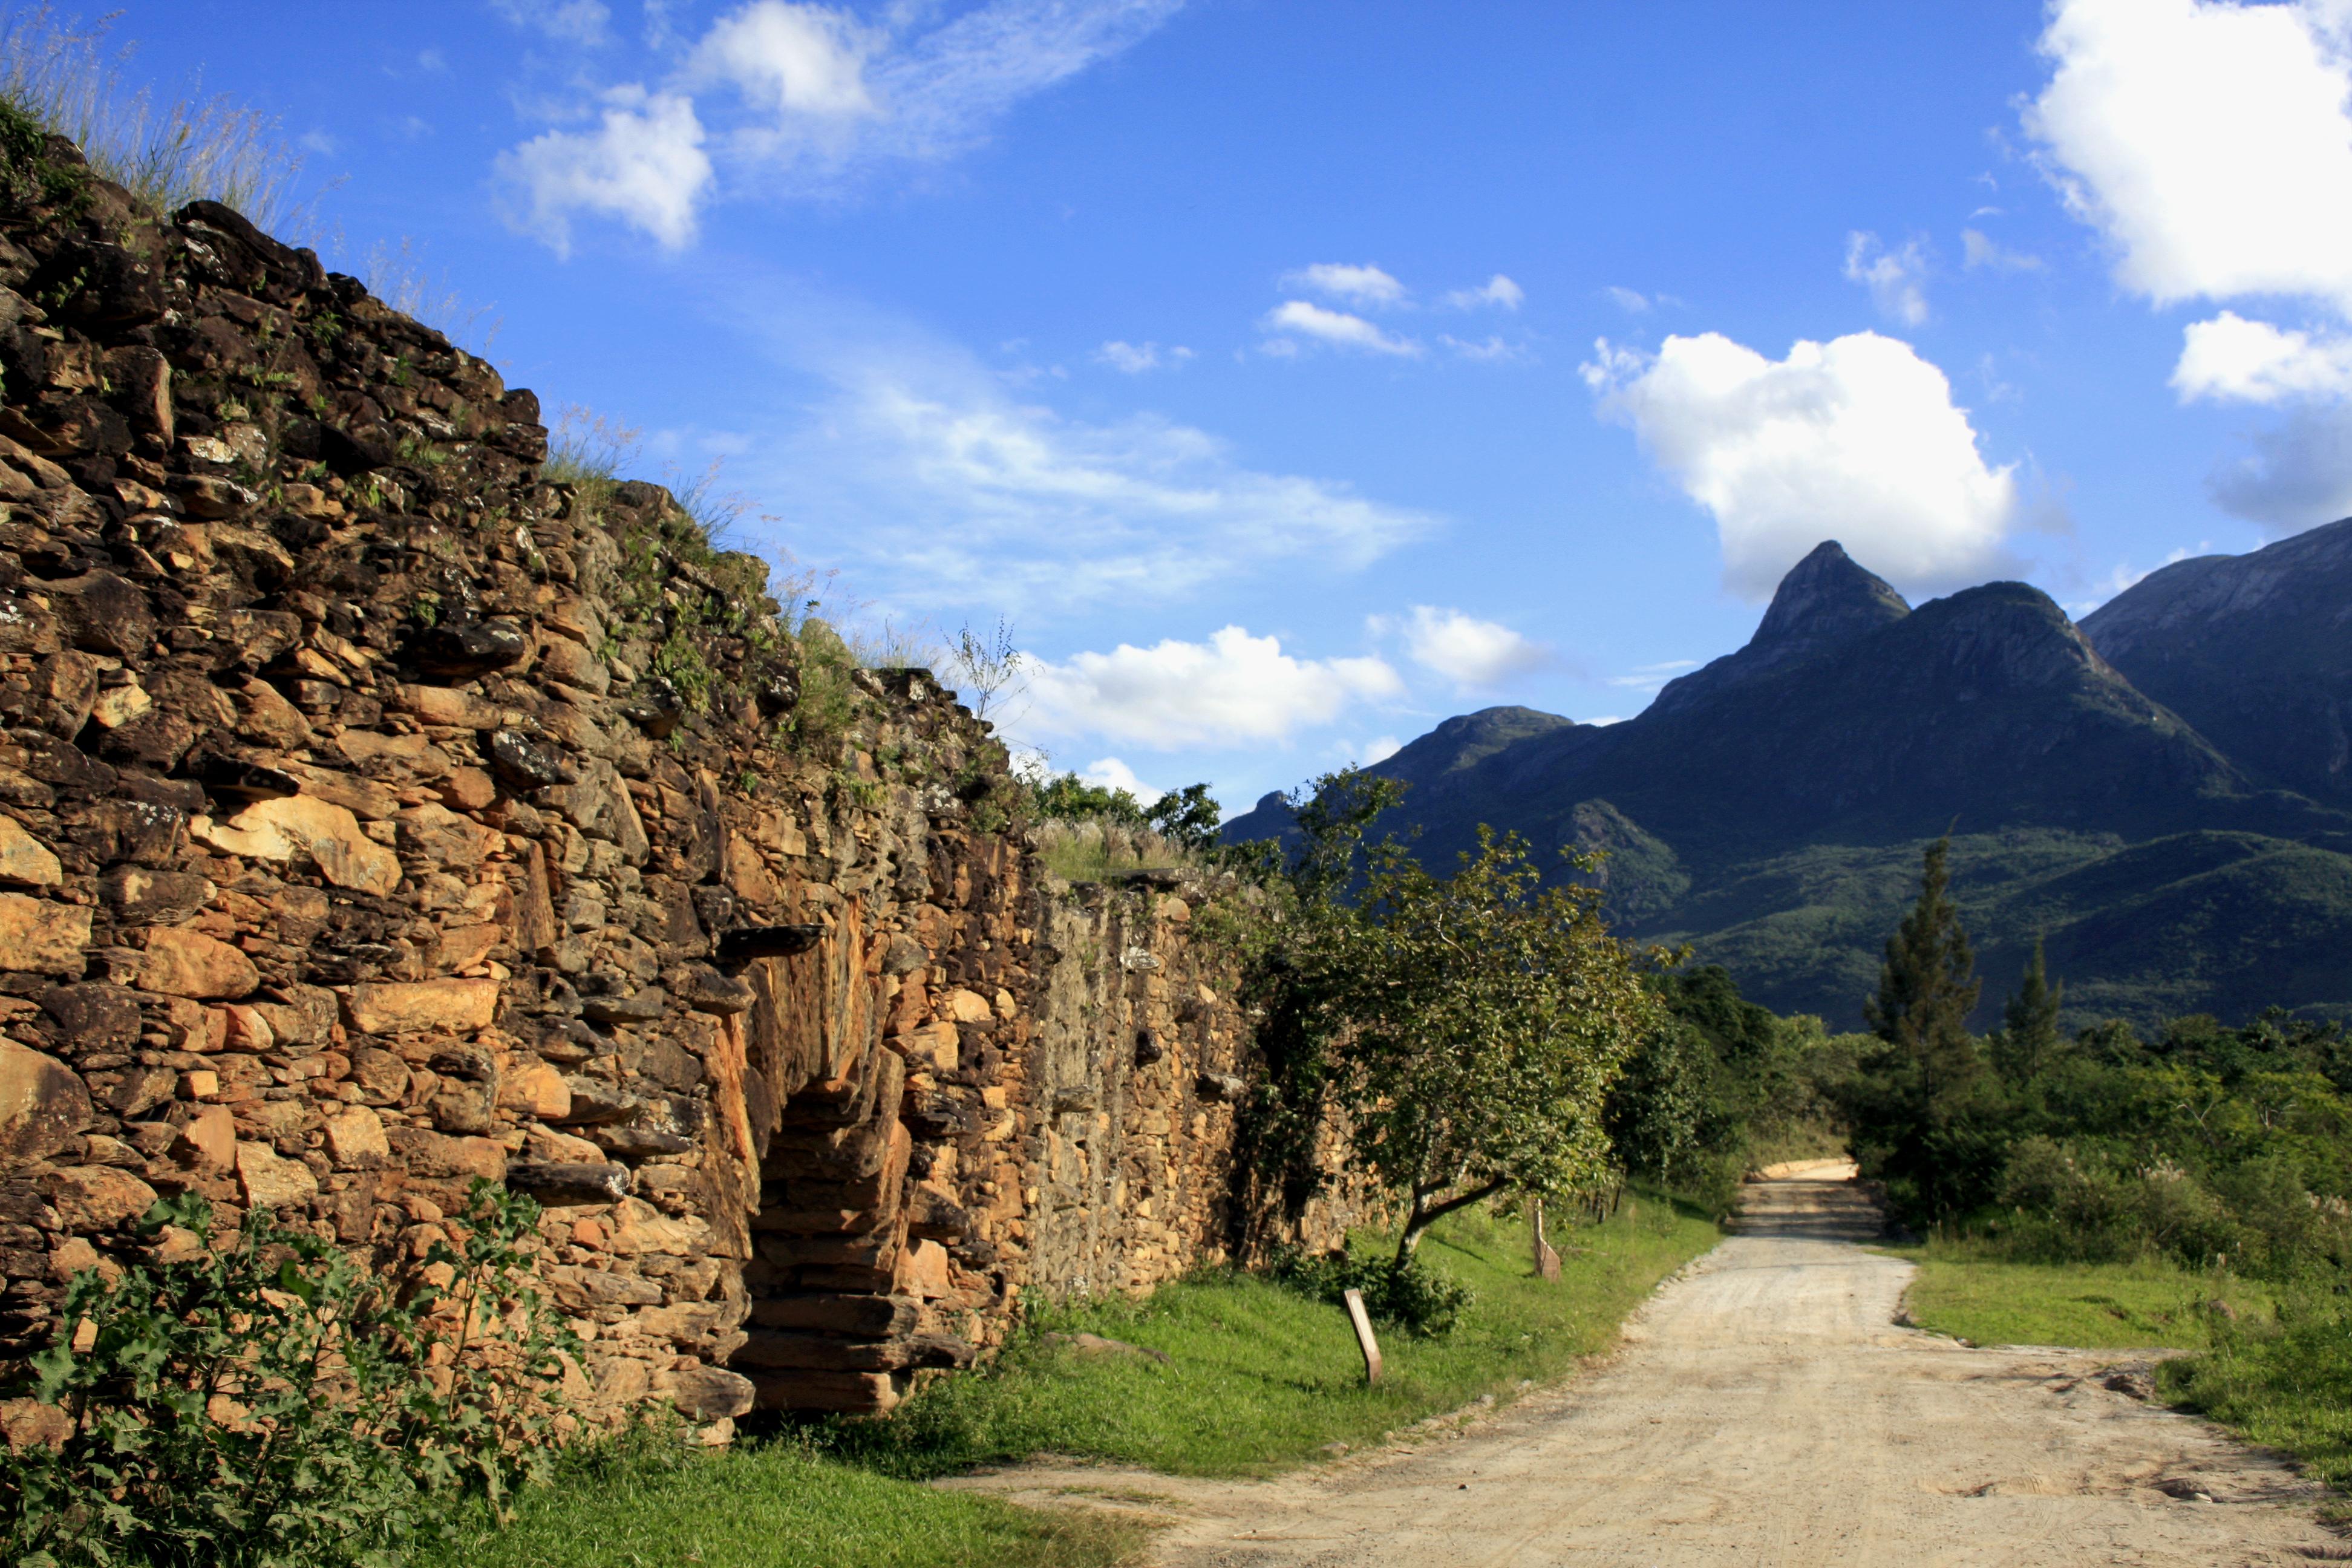 Bicame-de-Pedras-4984